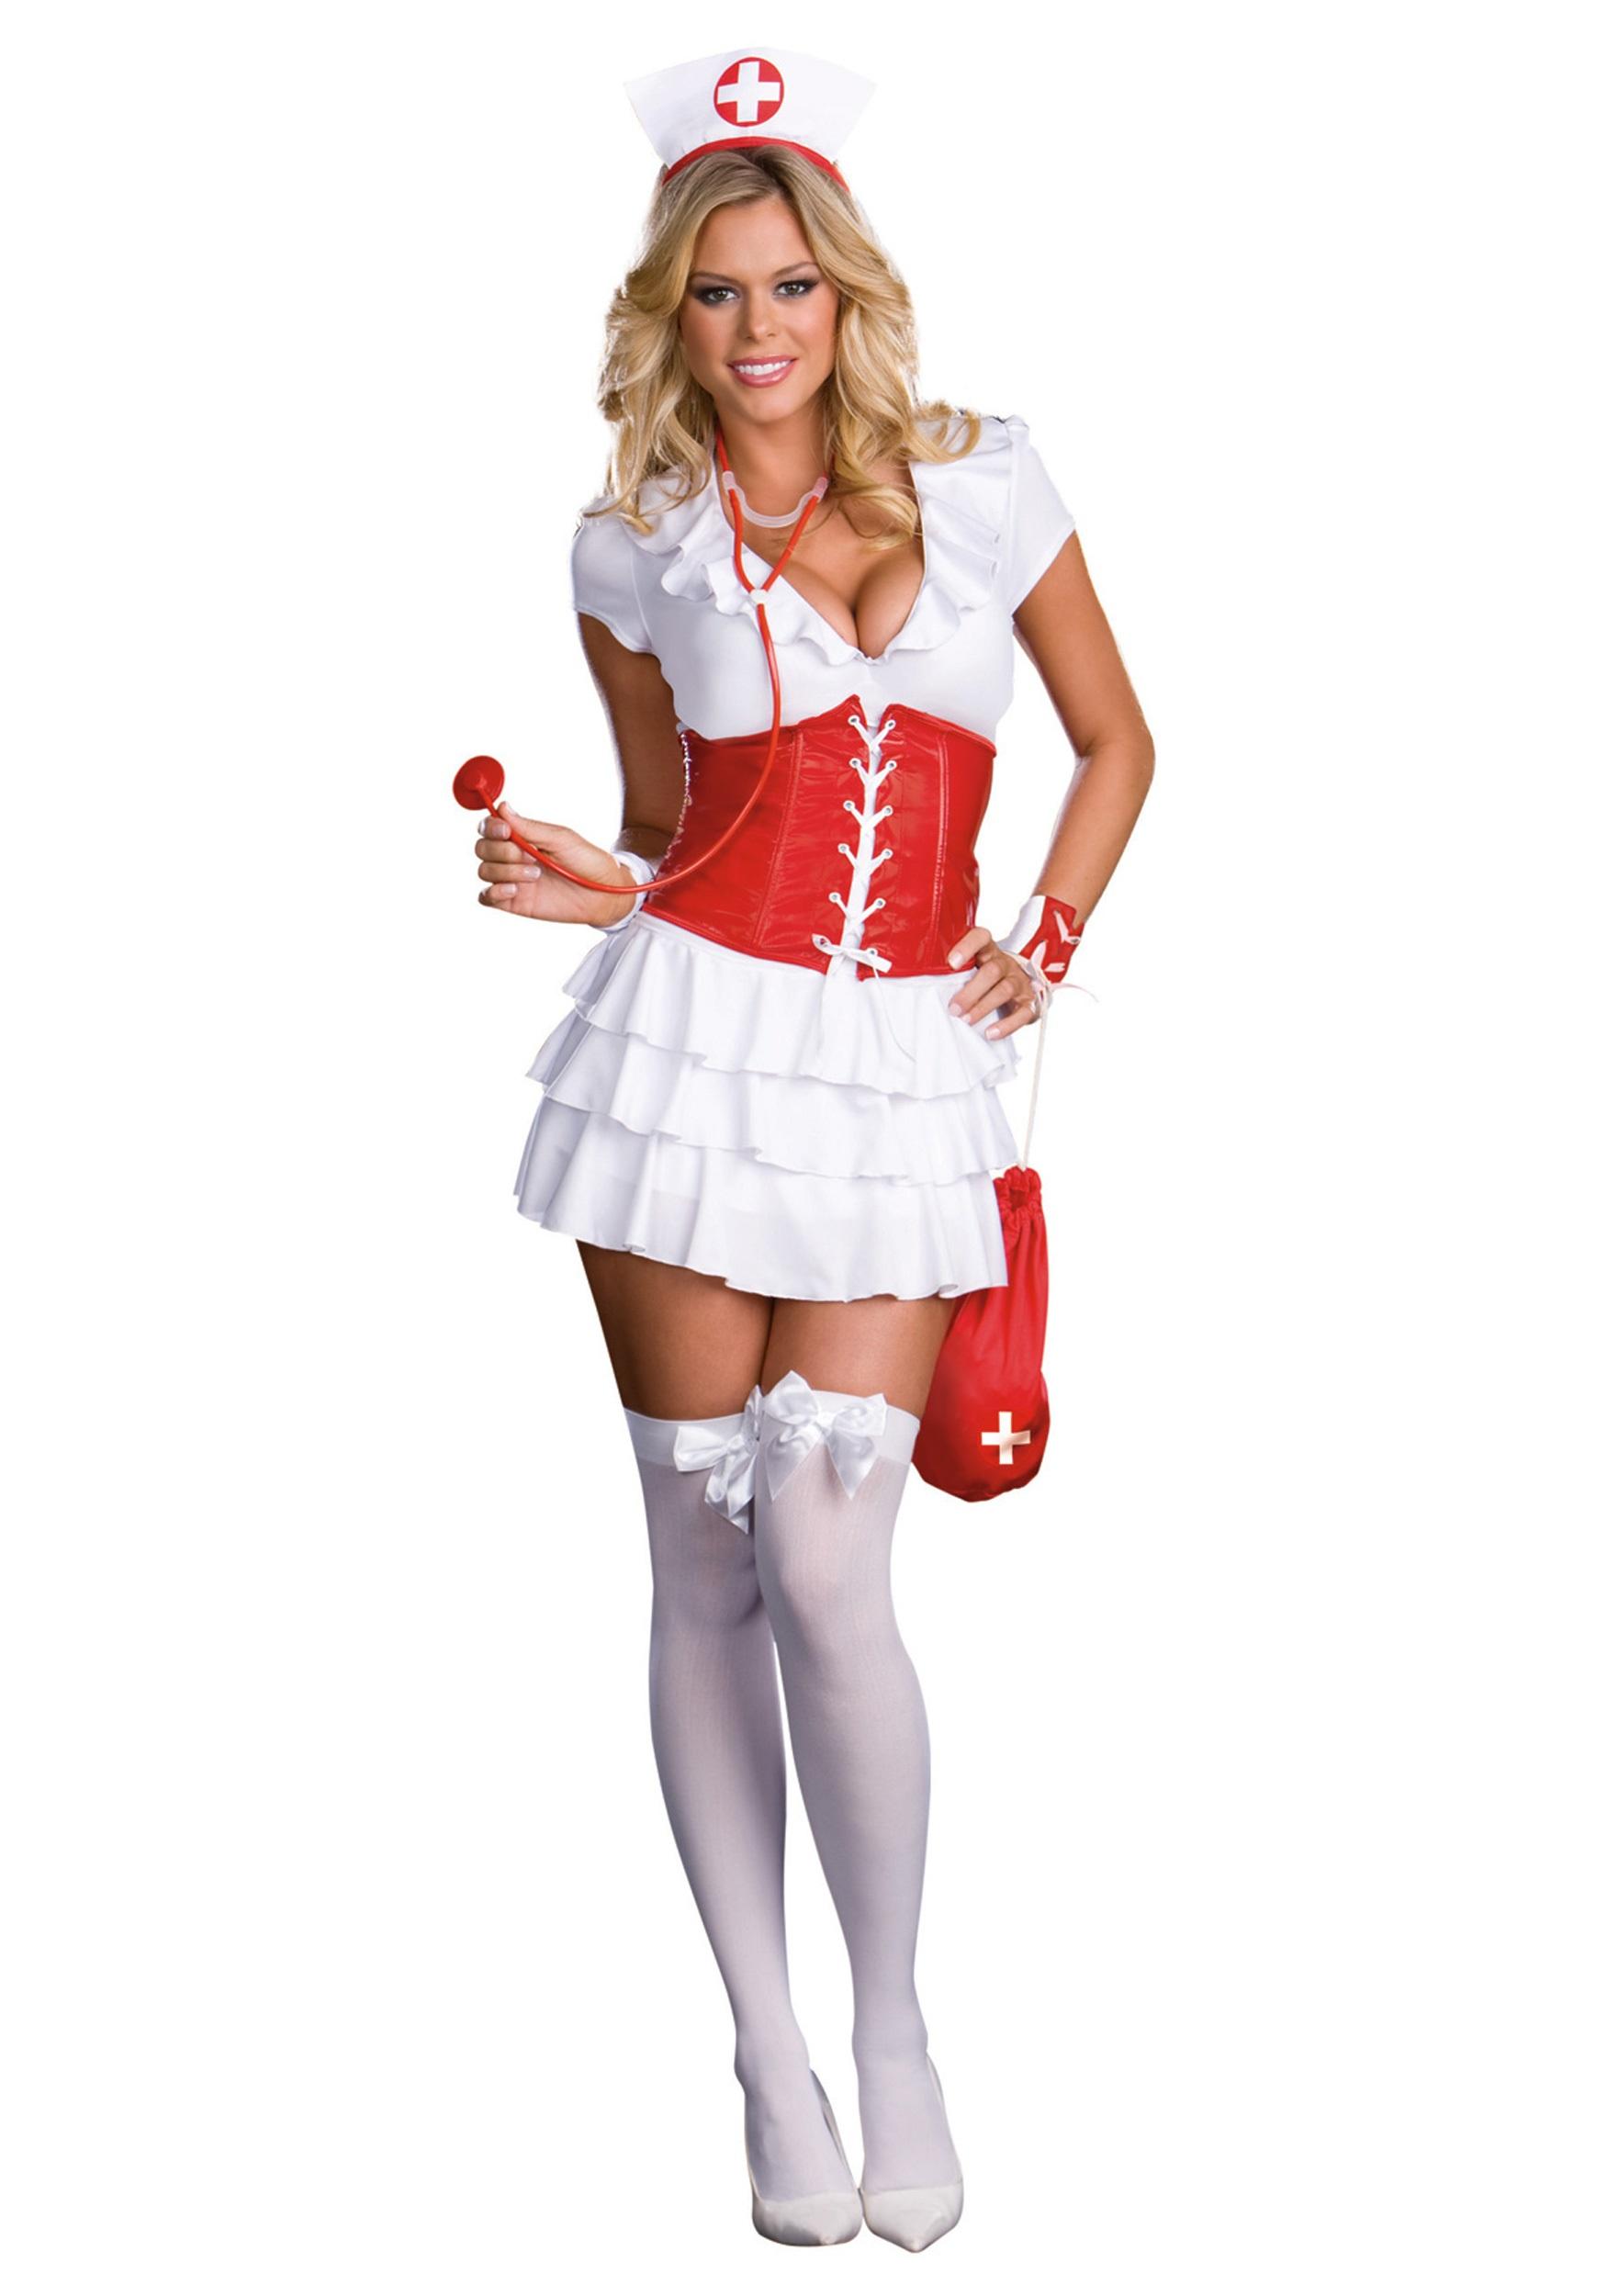 Women in nurse costume porn pics softcore cuties